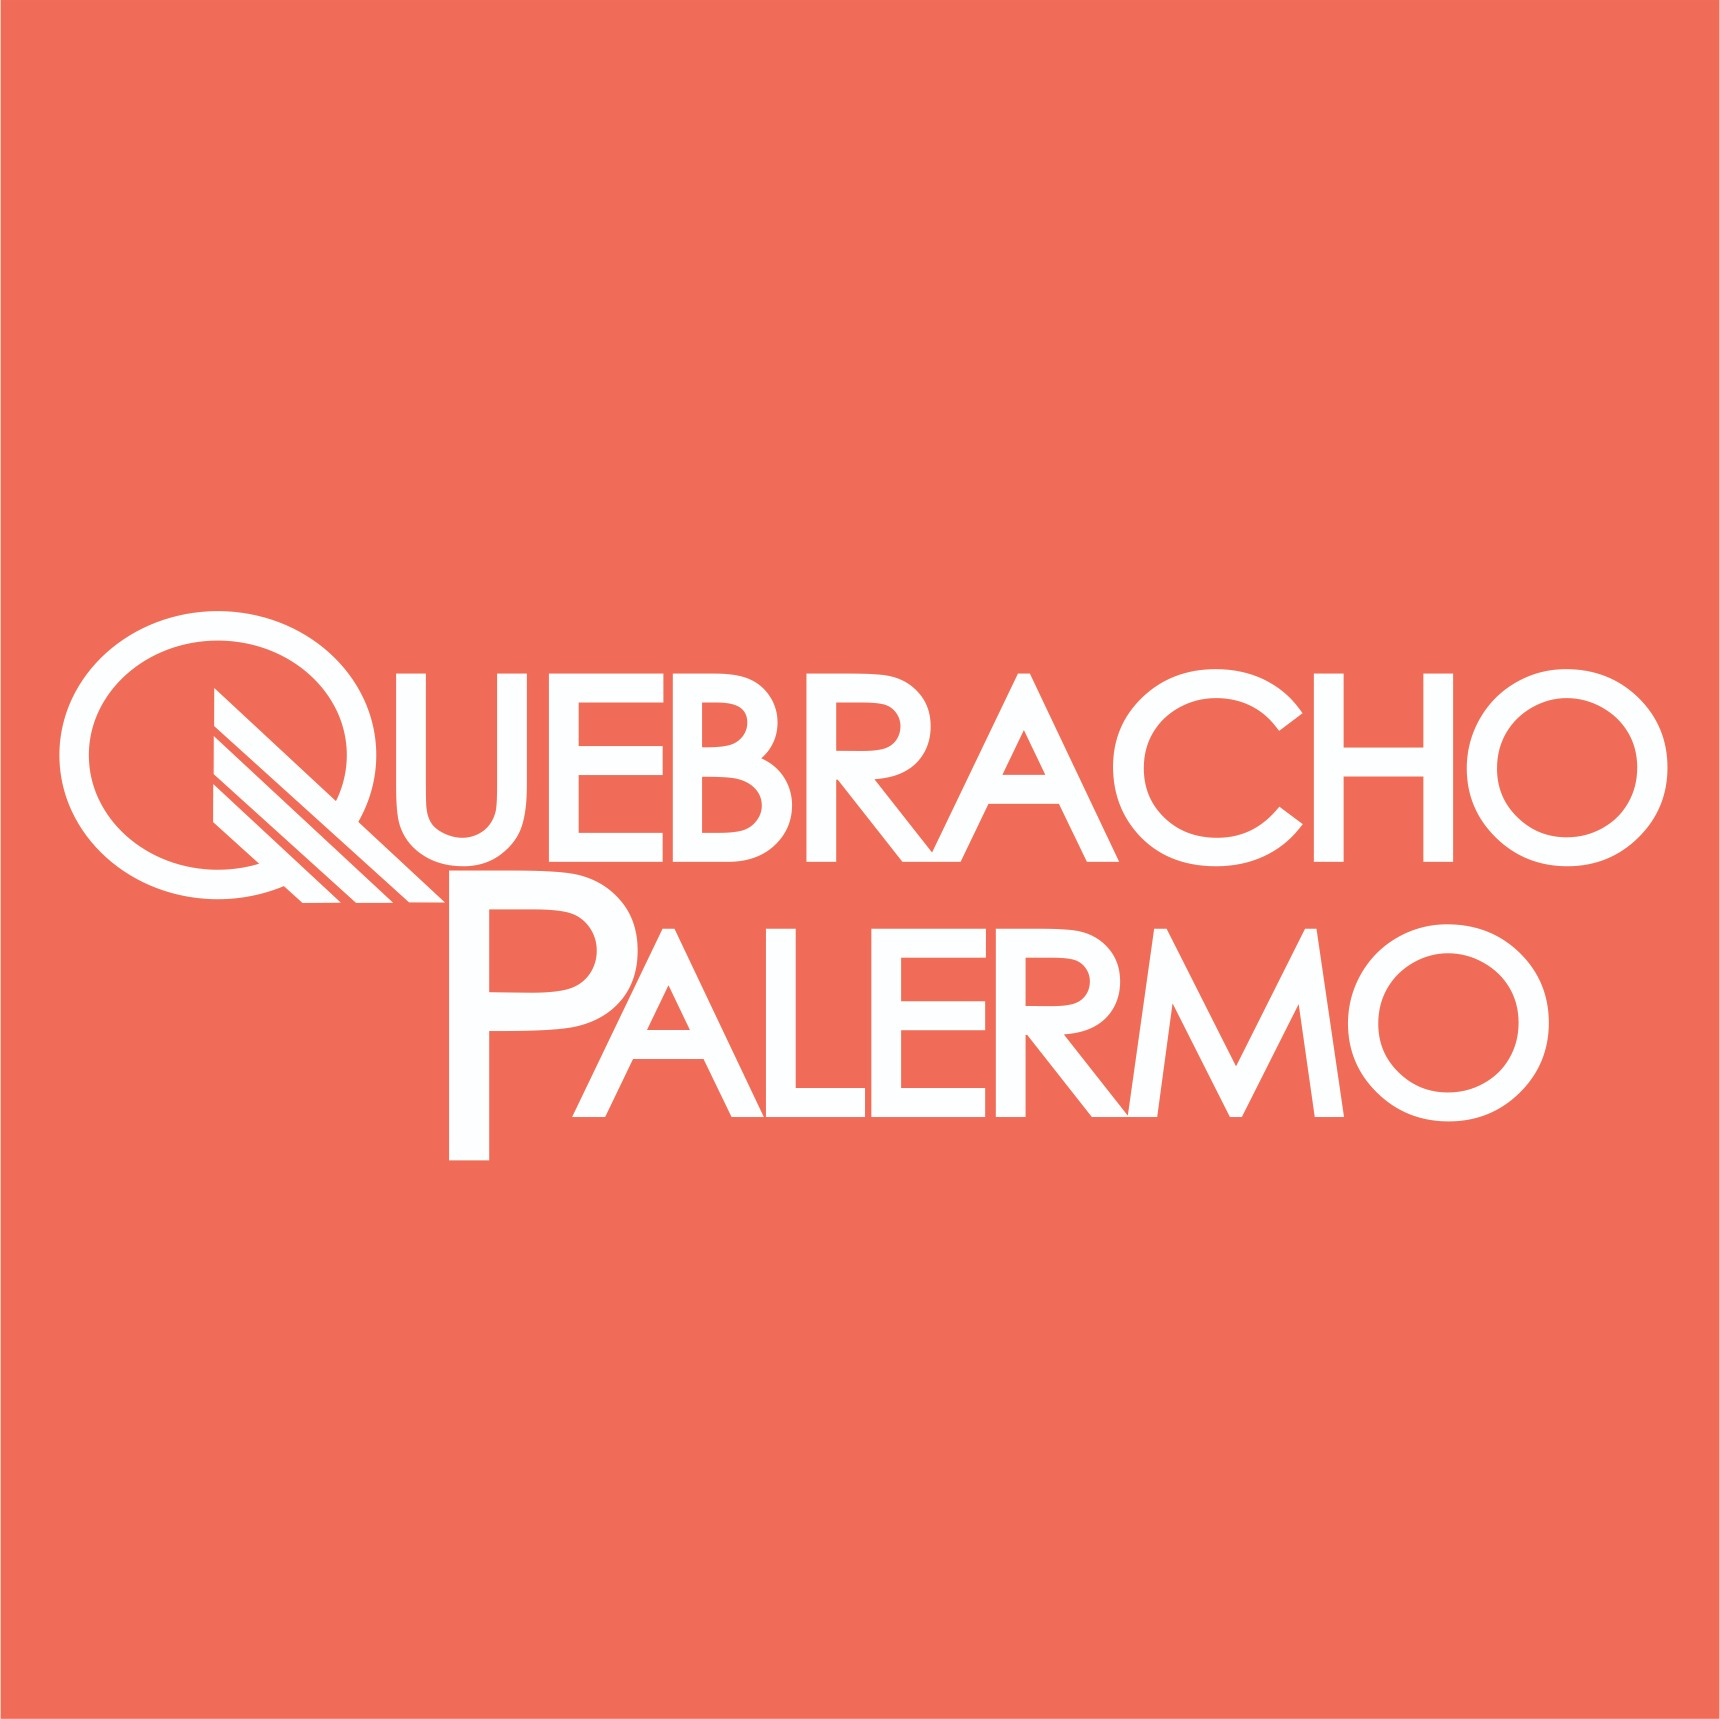 QUEBRACHOPALERMO